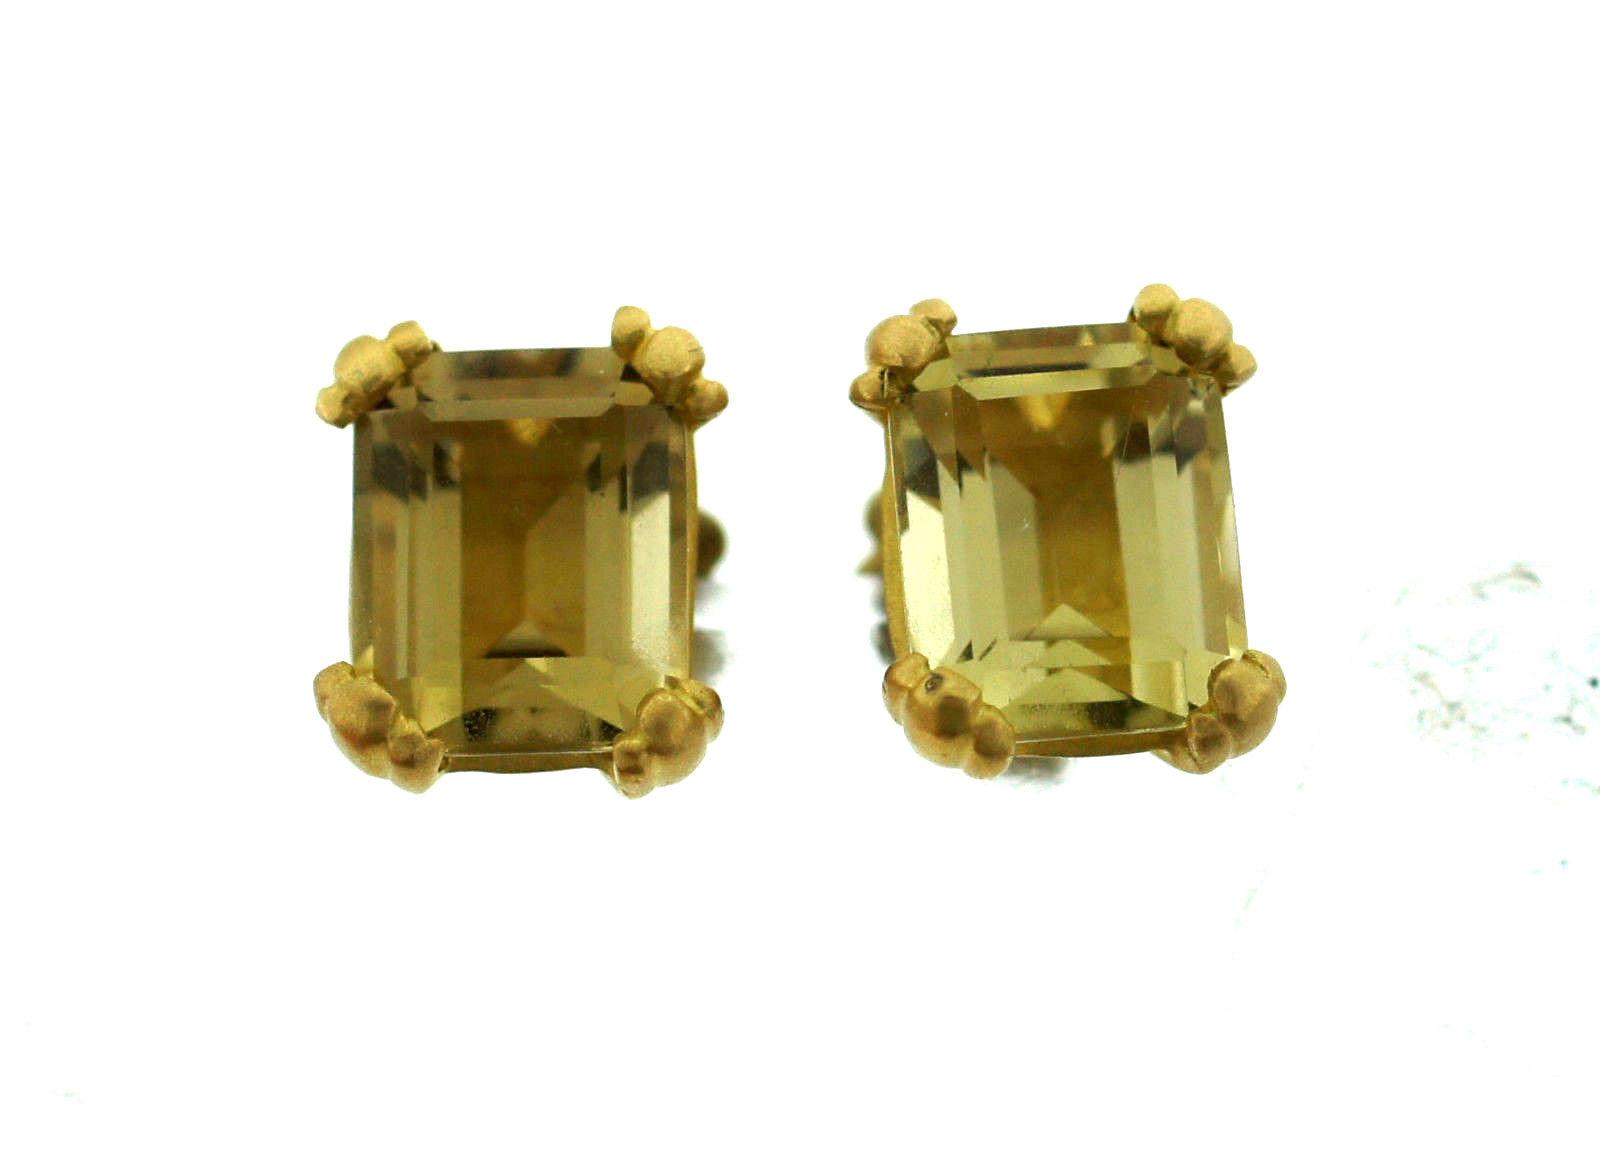 """""18K Yellow Gold Citrine Stud Earrings"""""" 65104"